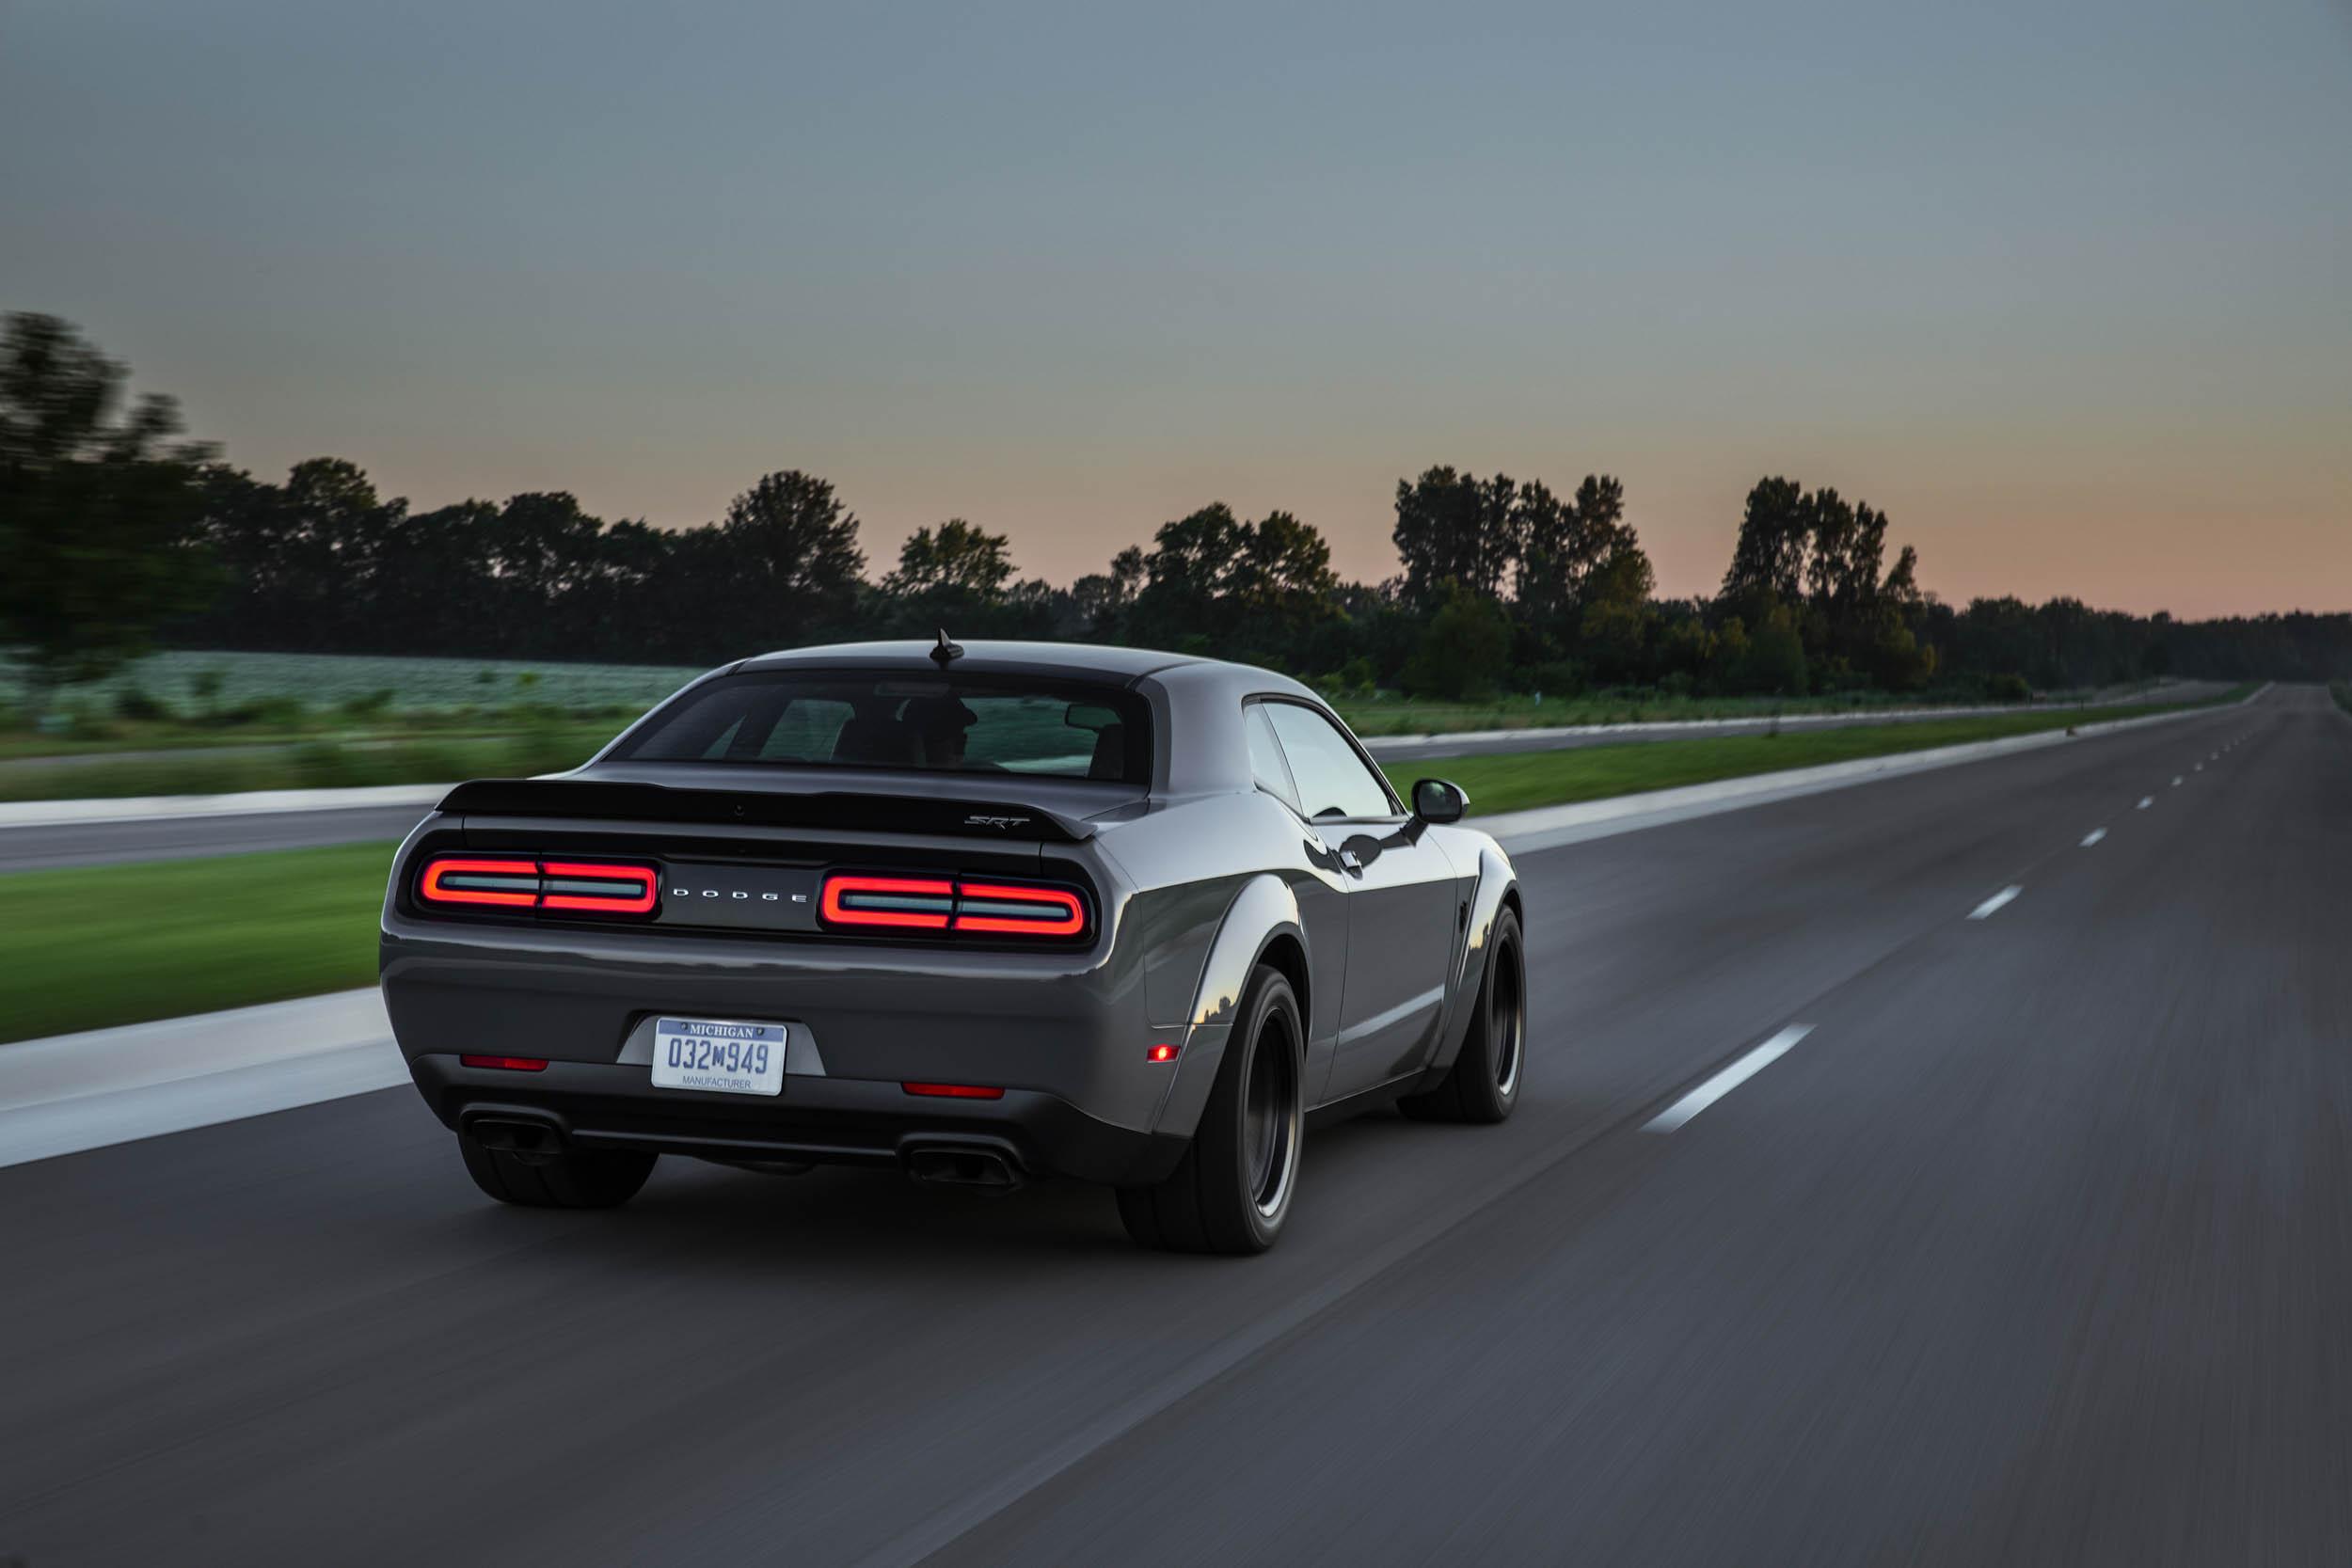 2018 Dodge Challenger SRT Demon rear 3/4